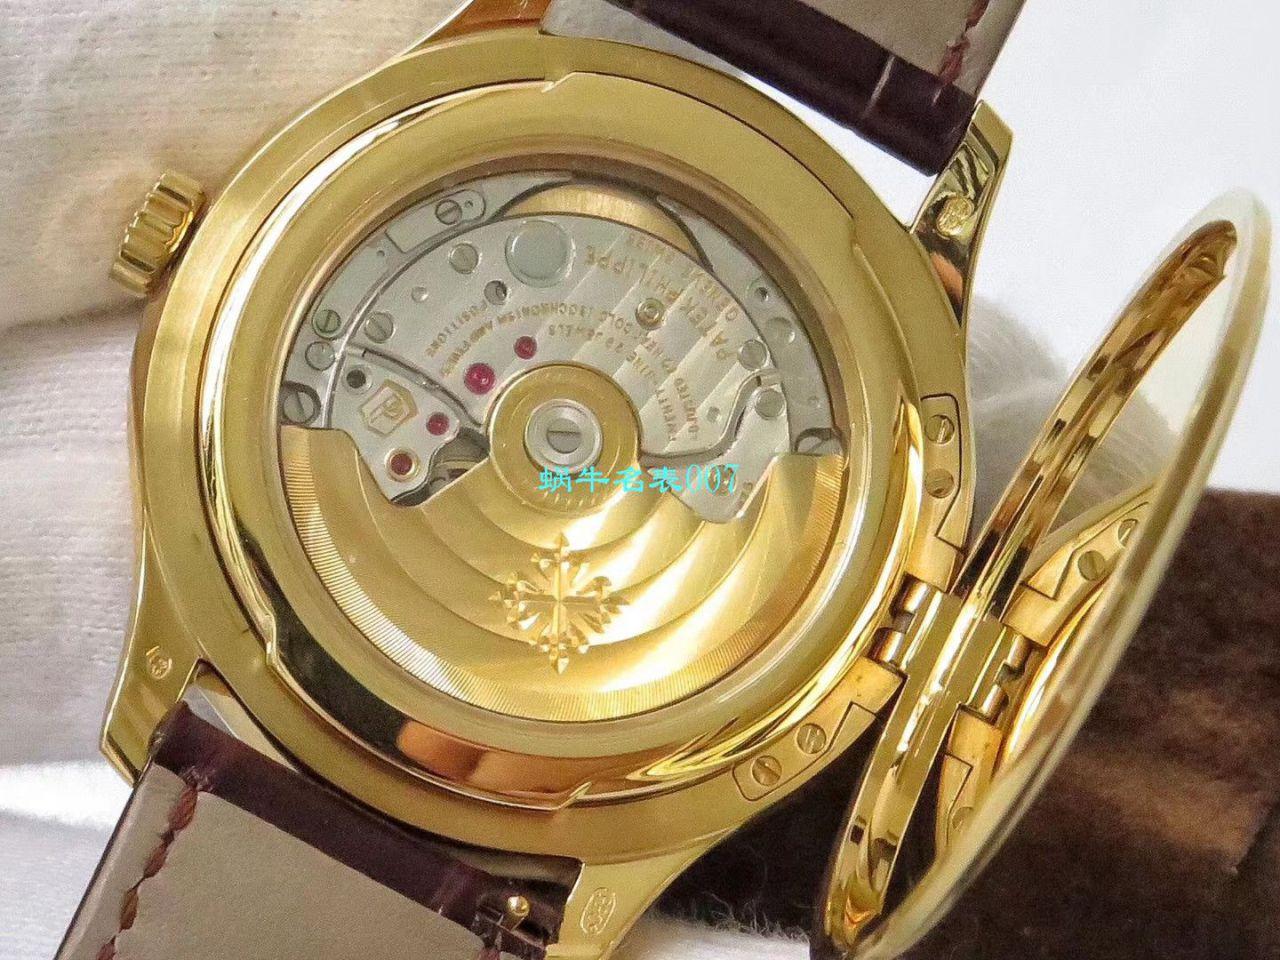 【ZF厂复刻手表】百达翡丽古典表系列5227J-001腕表 / BD278